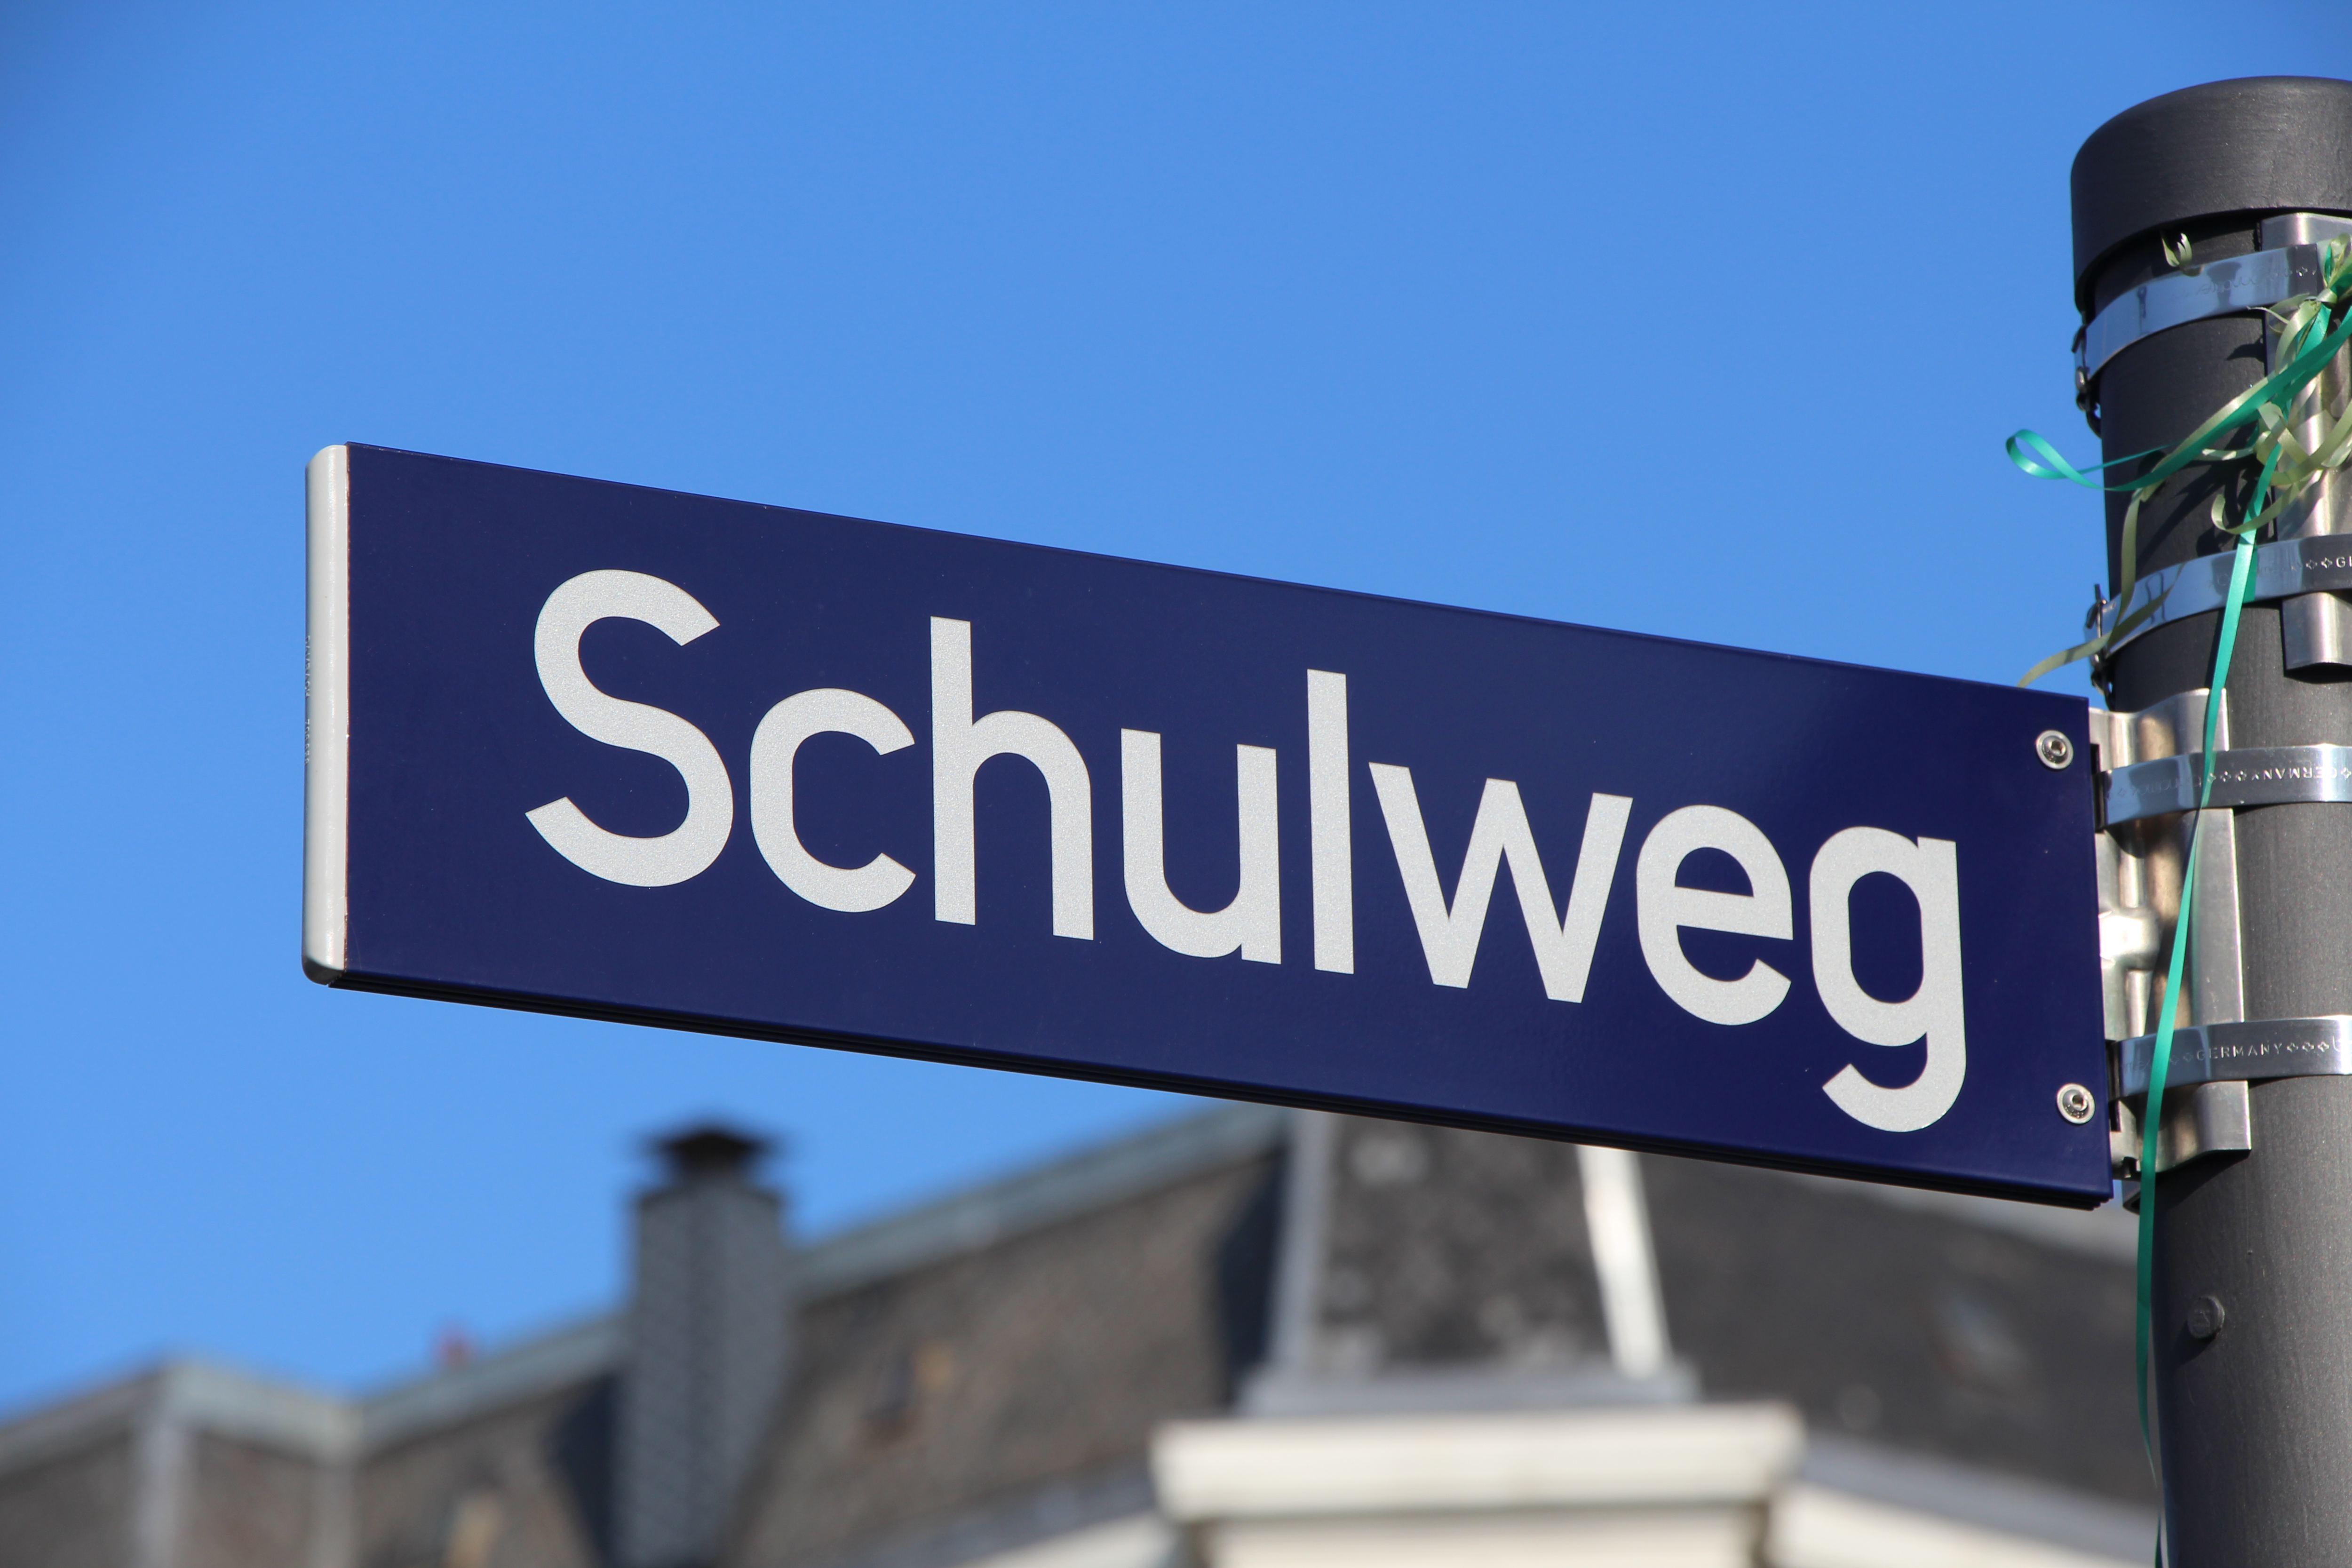 Straßennamen in Eimsbüttel: Der Schulweg